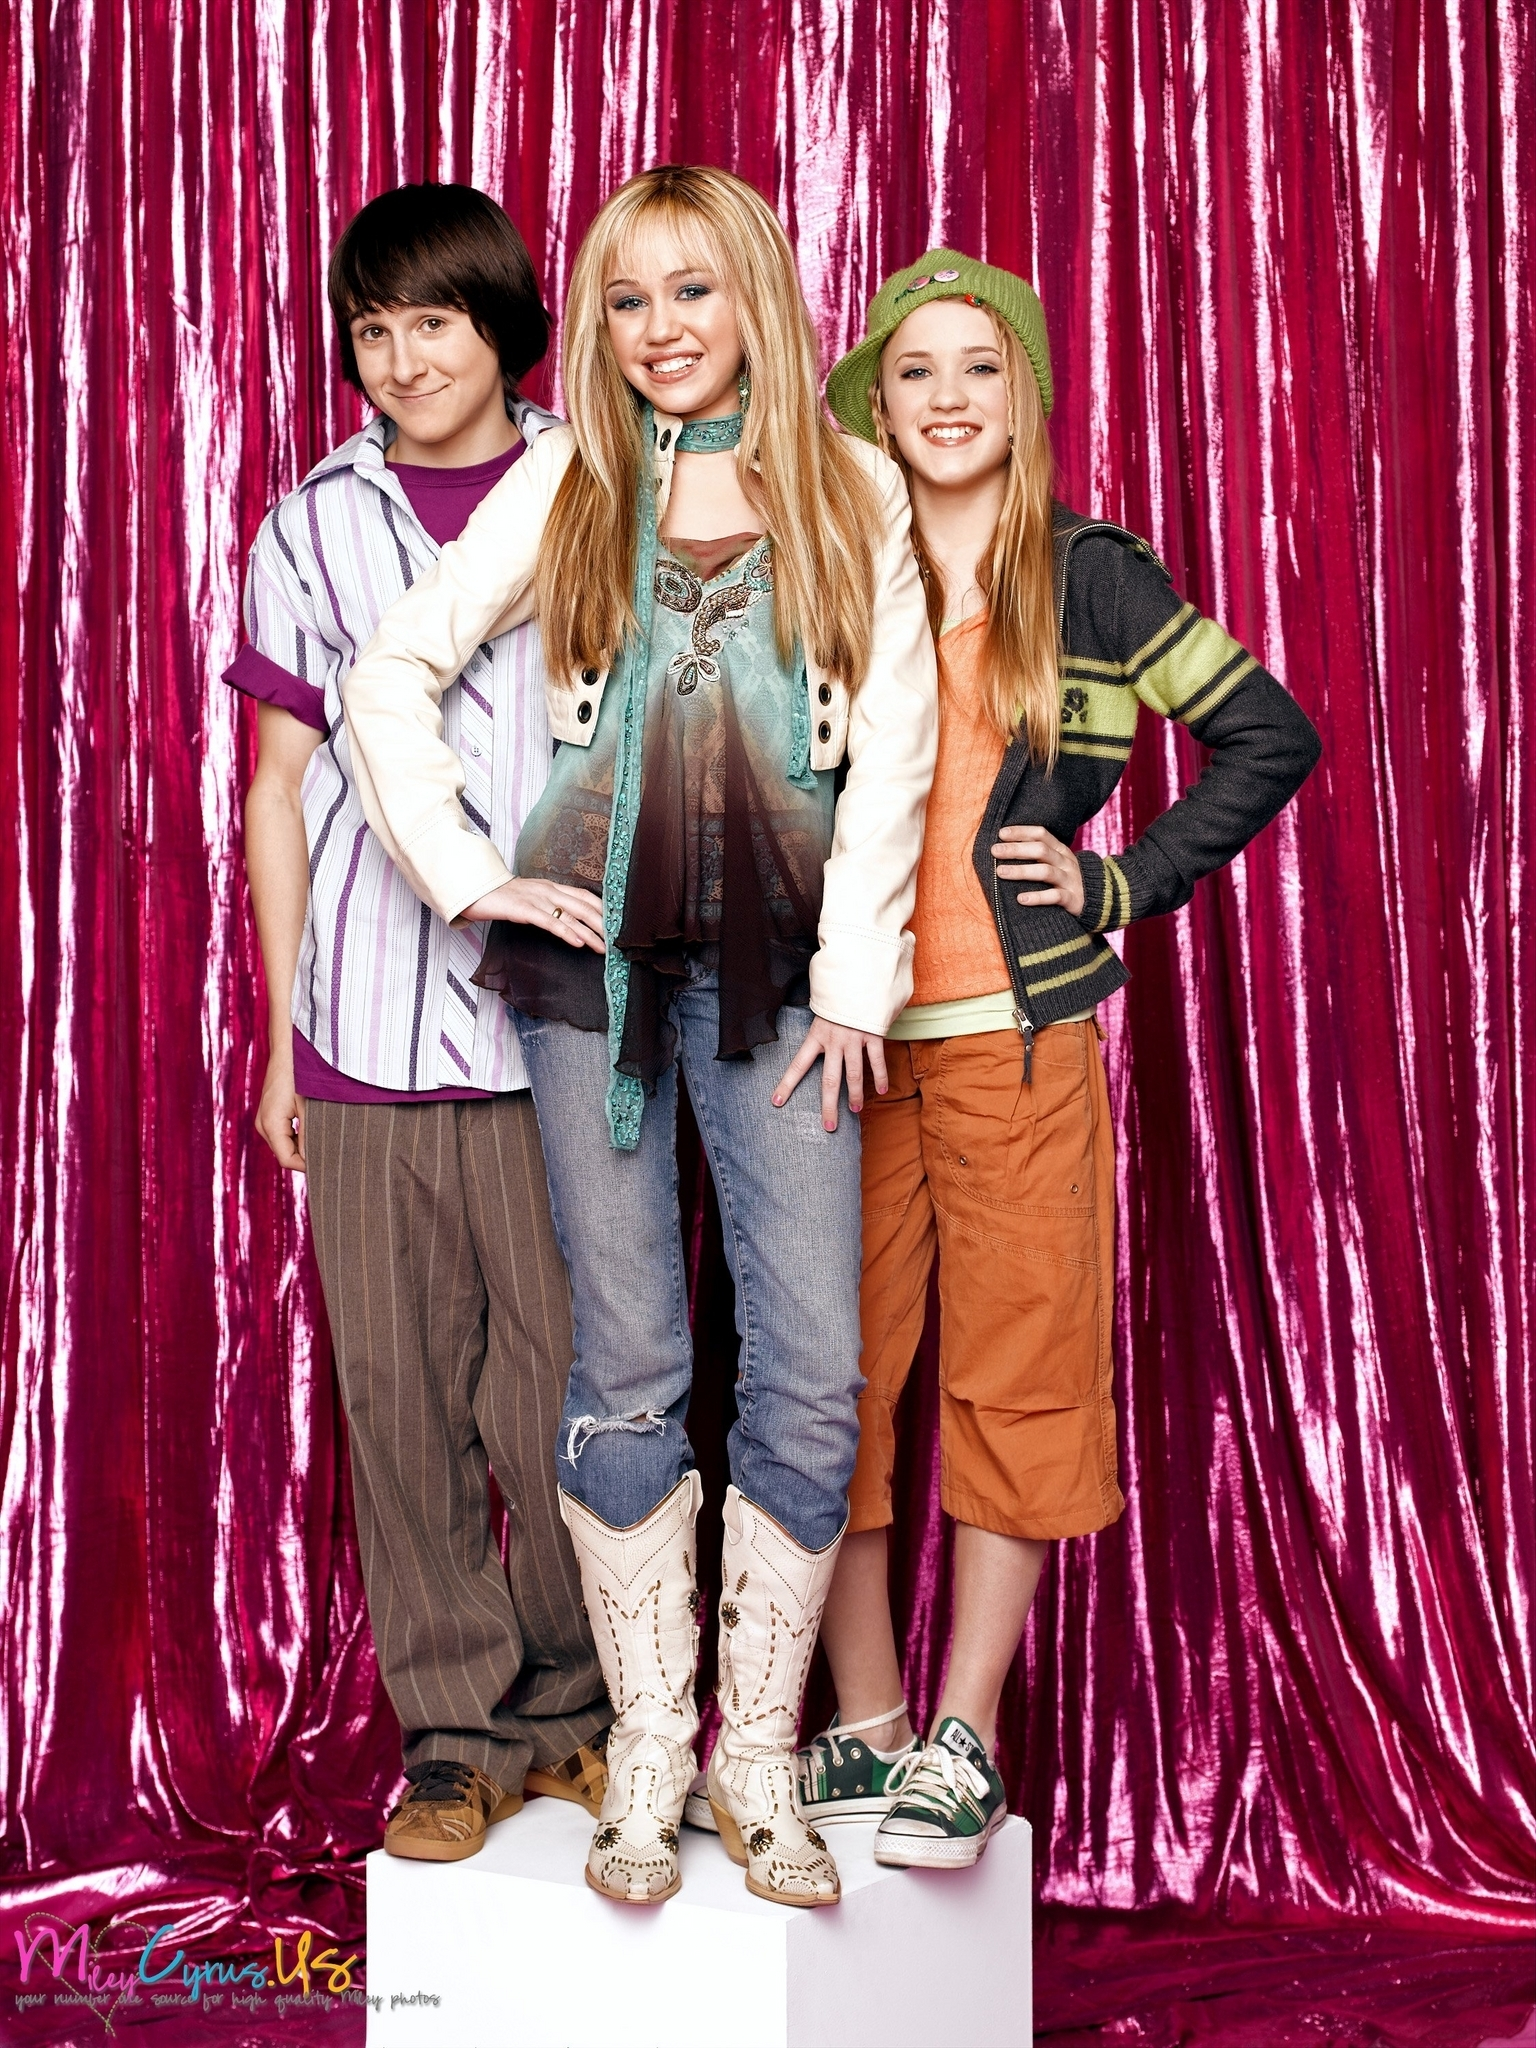 Hannah Montana Season 1 Promotional fotos [HQ] <3